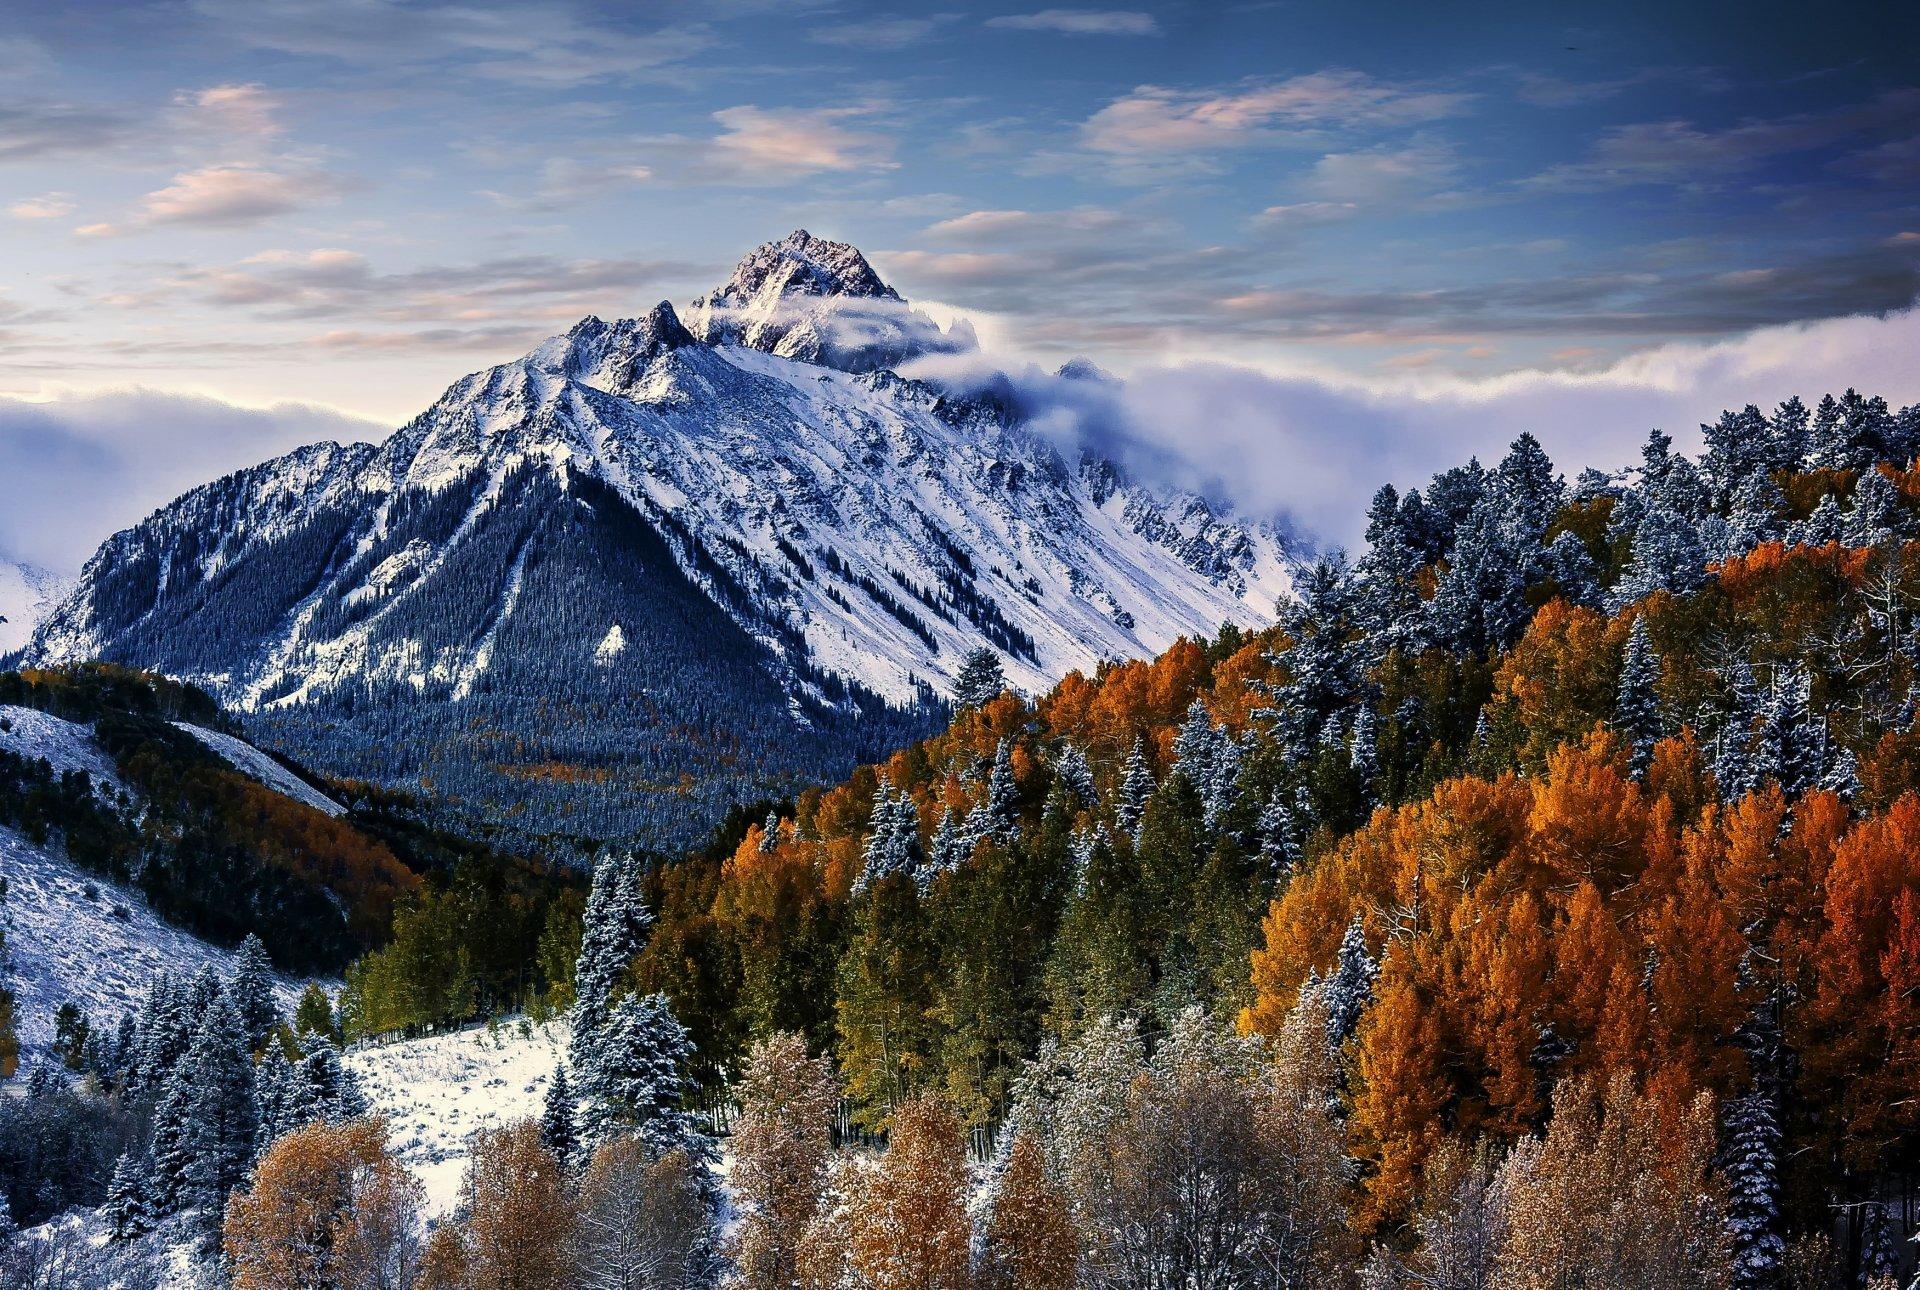 Majestic mount sneffles hd wallpaper background image - Colorado desktop background ...